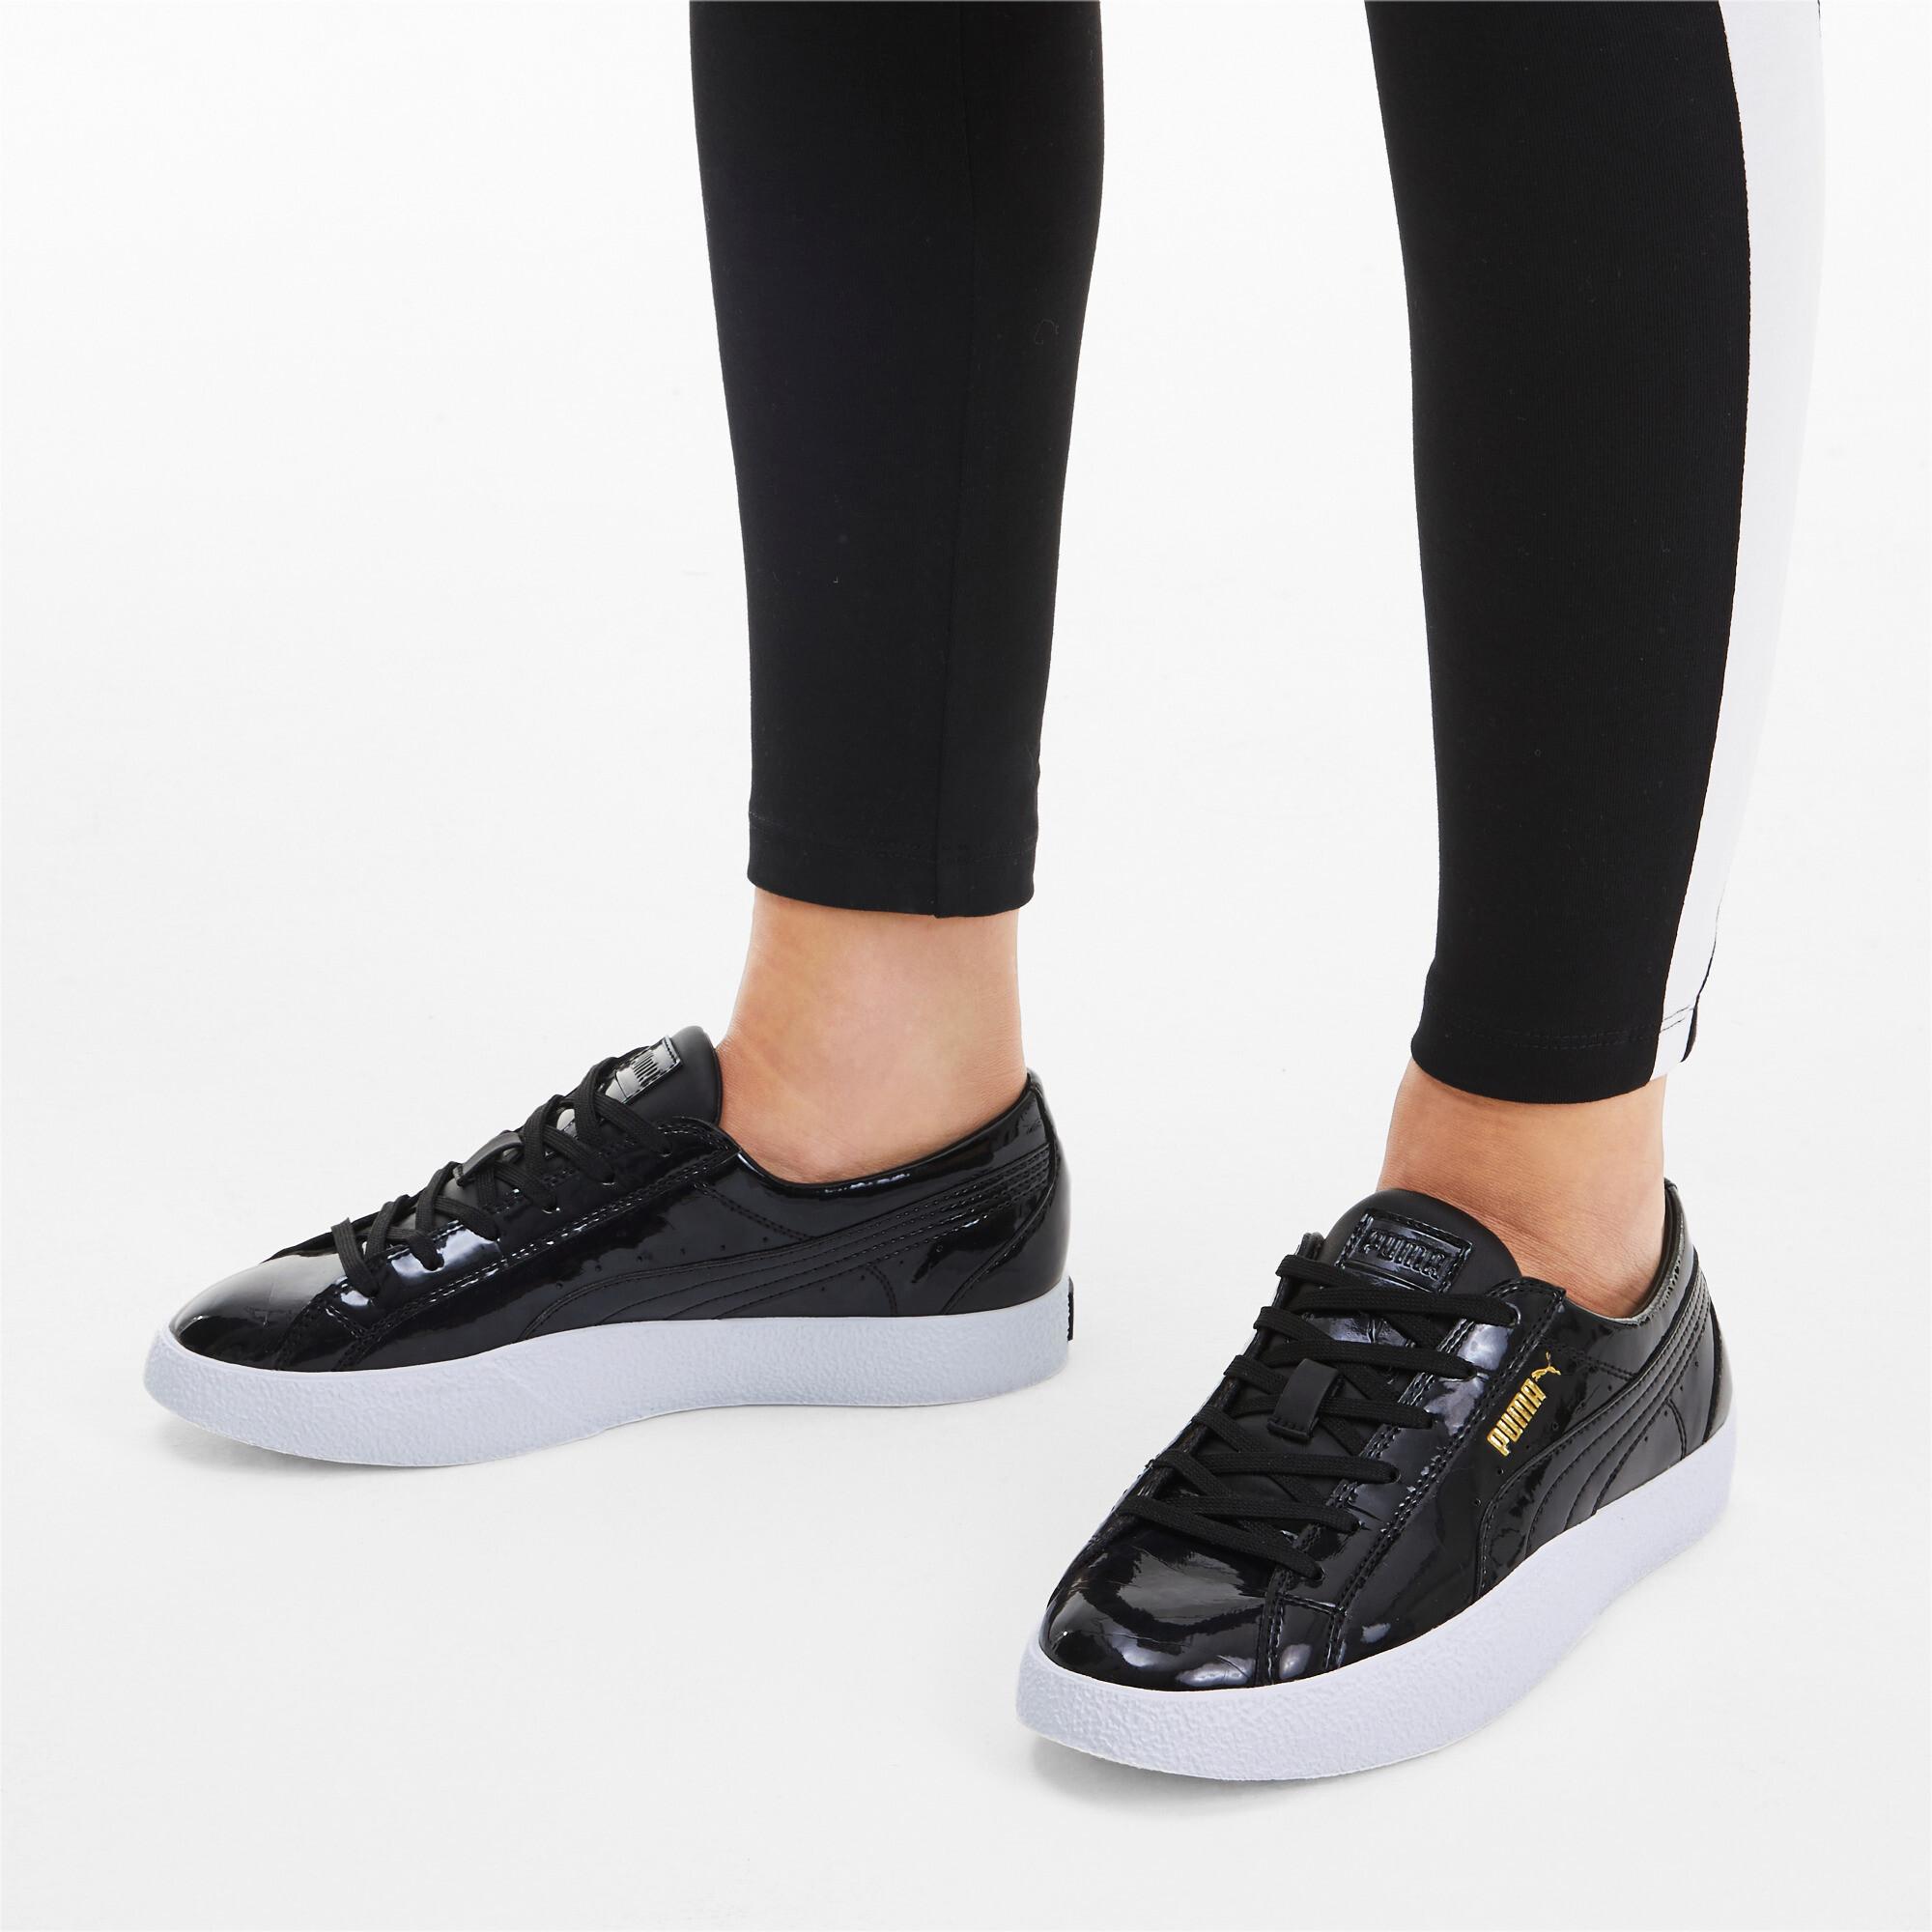 PUMA-Women-039-s-Love-Patent-Sneakers thumbnail 5